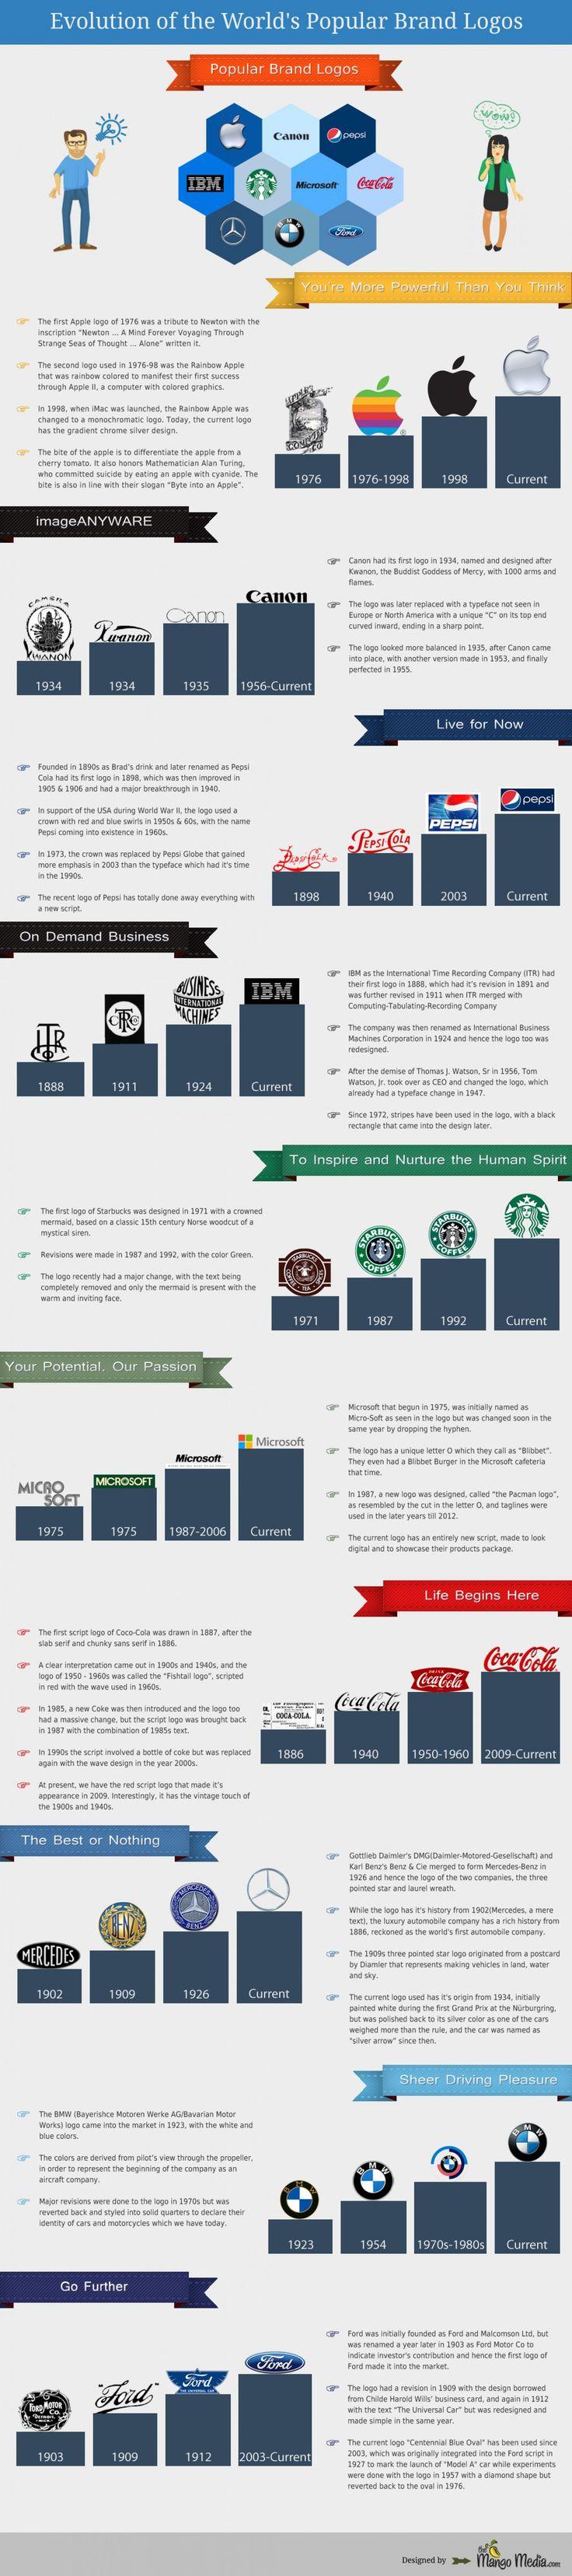 Evolution of the World's Popular Brand Logos